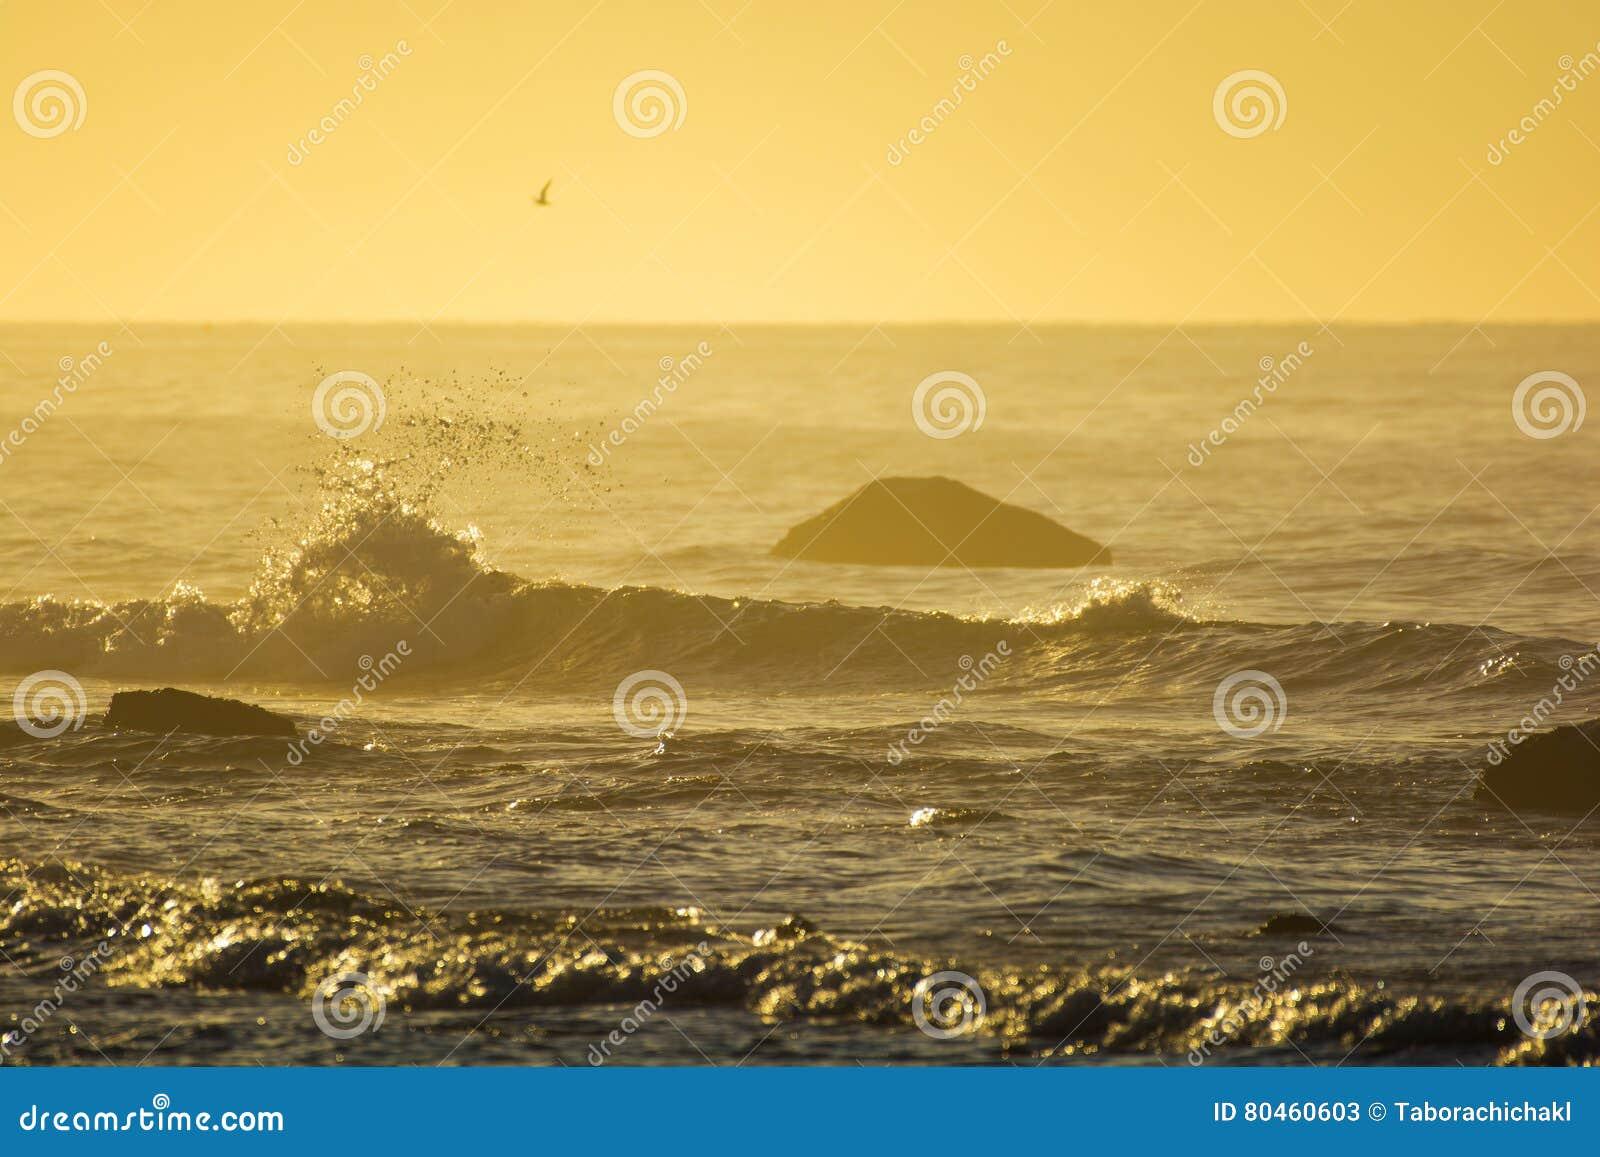 Sunrise Over The Atlantic Ocean In Long Island New York Stock Image